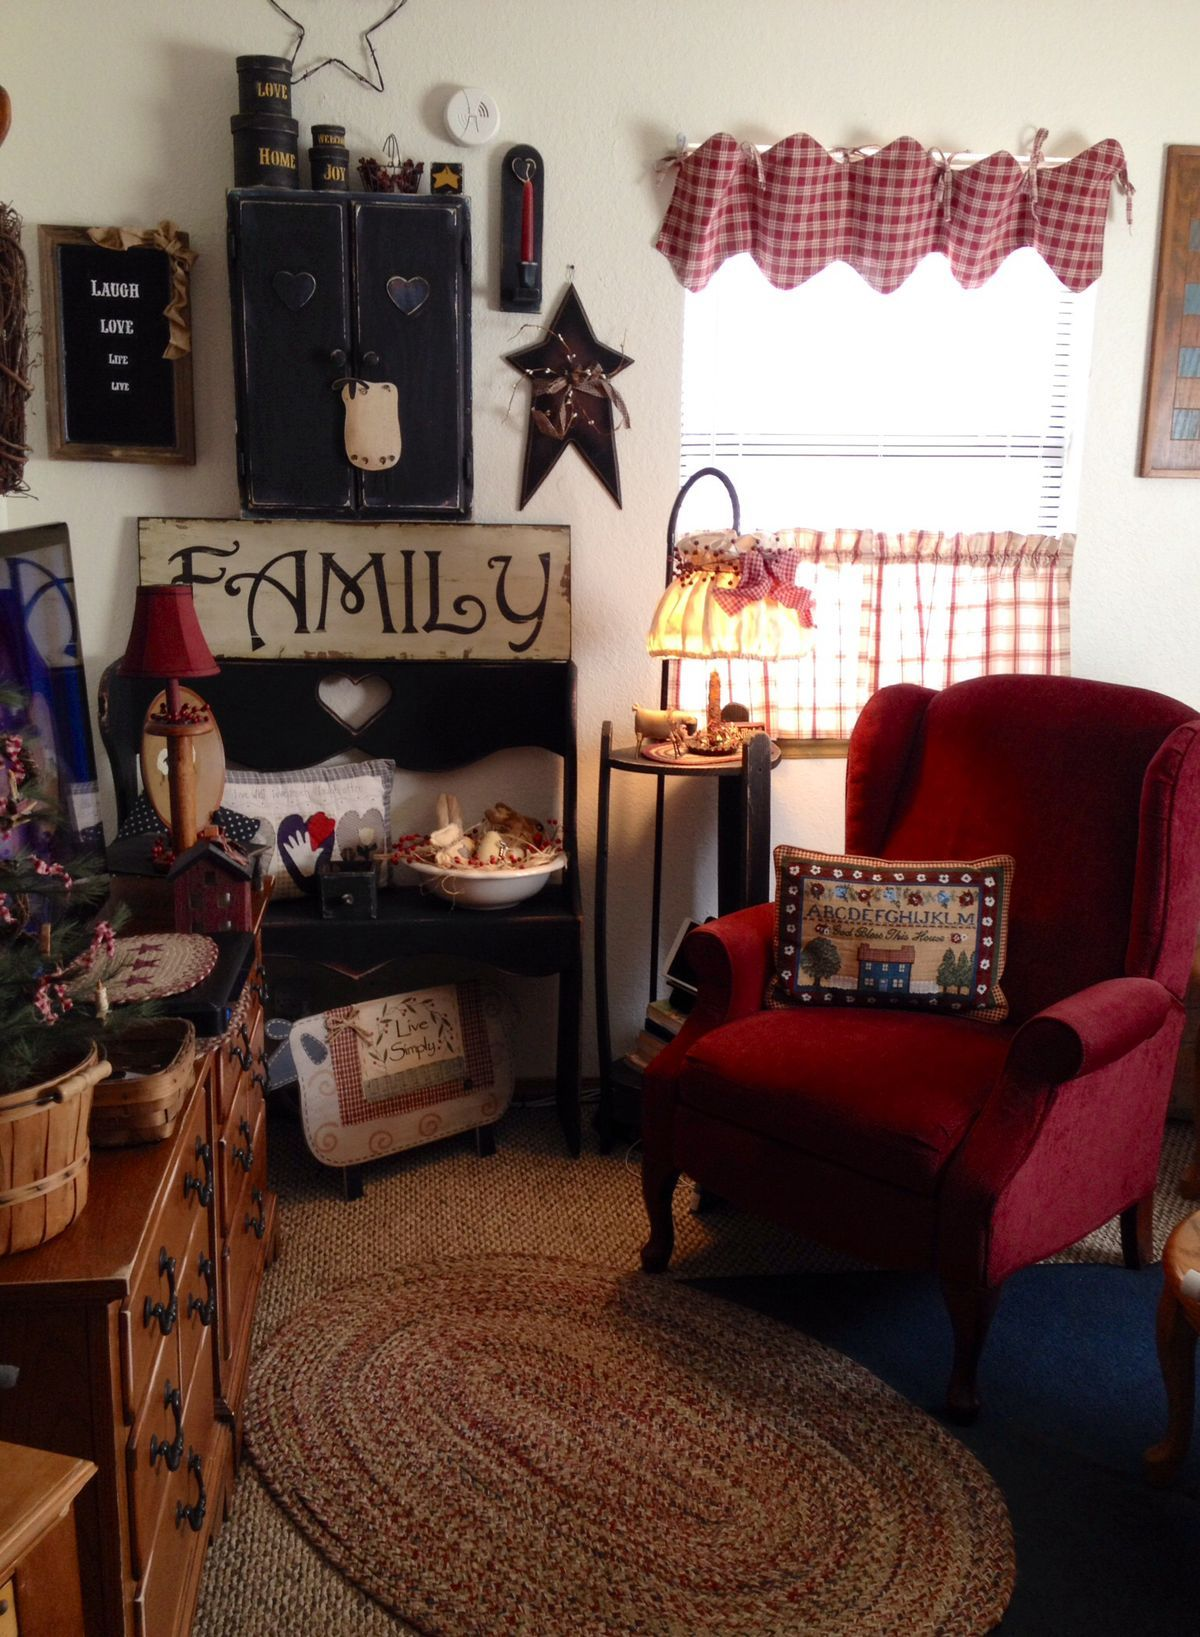 13ea503c868beb4bff5d2b5627dc43cc 1,200×1,637 Pixels | Primitive |  Pinterest | Primitives, Primitive Living Room And Country Decor Part 62